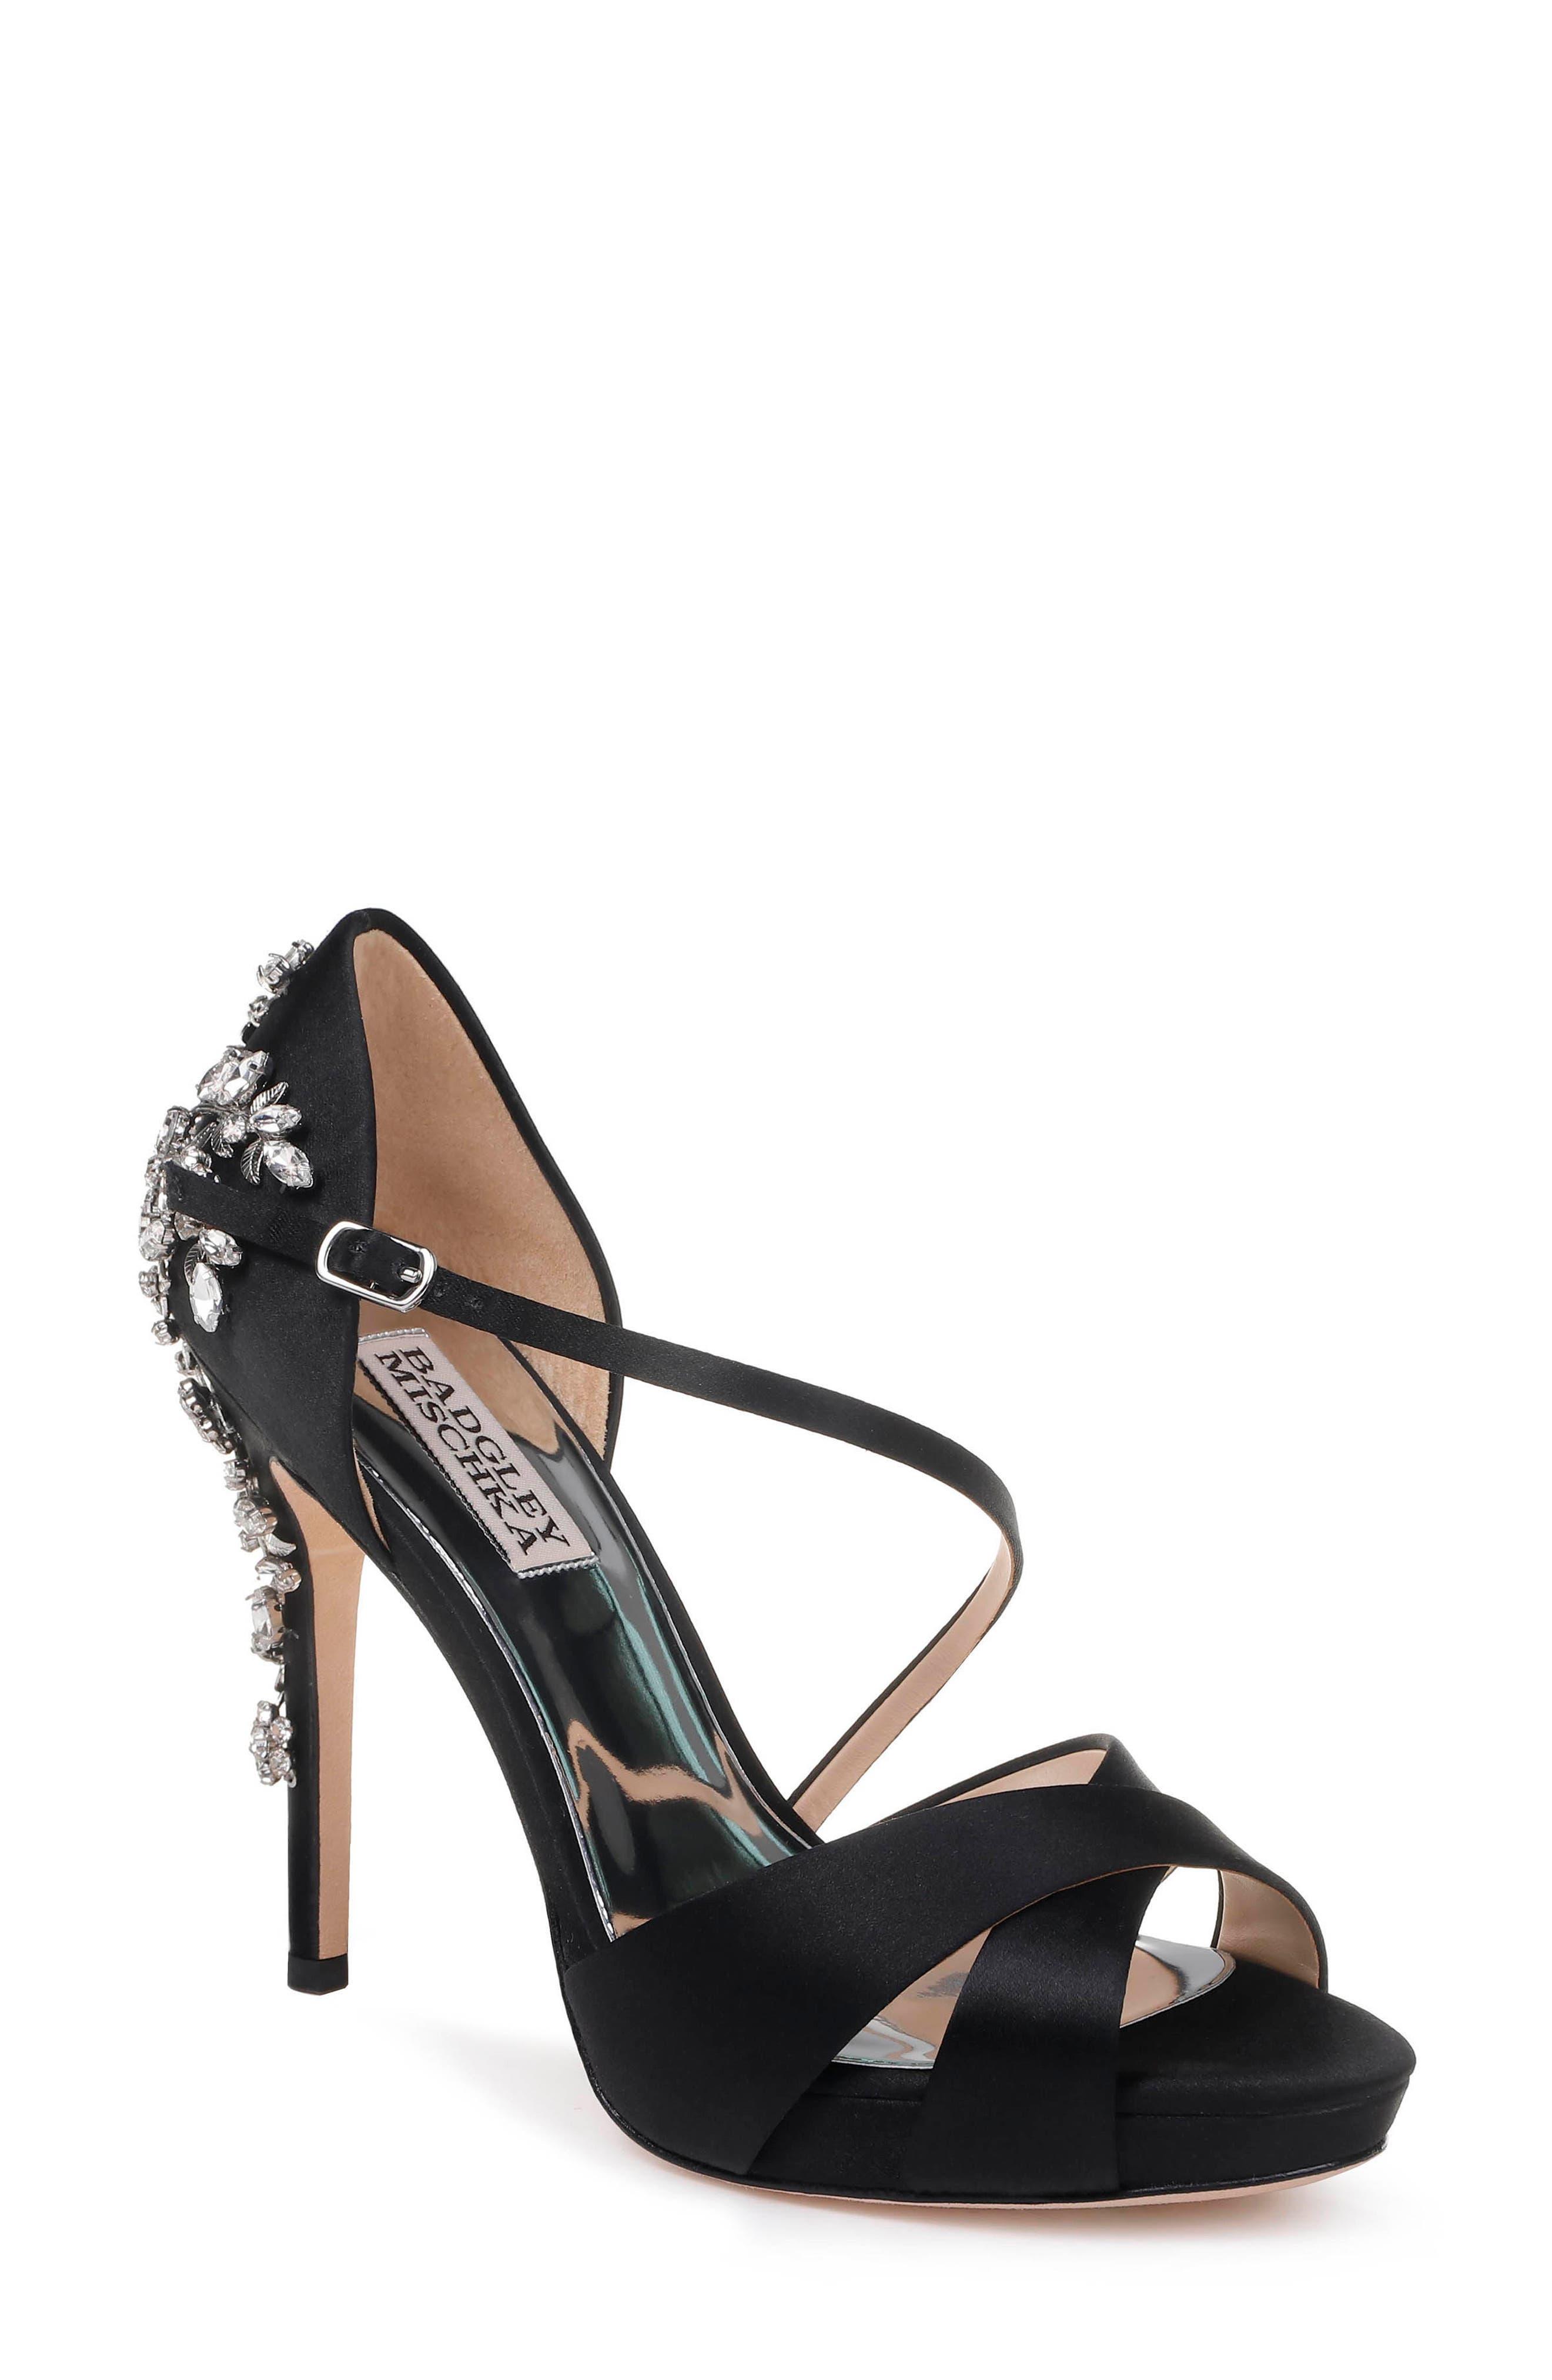 BADGLEY MISCHKA Fame Satin Platform Sandals in Black Satin